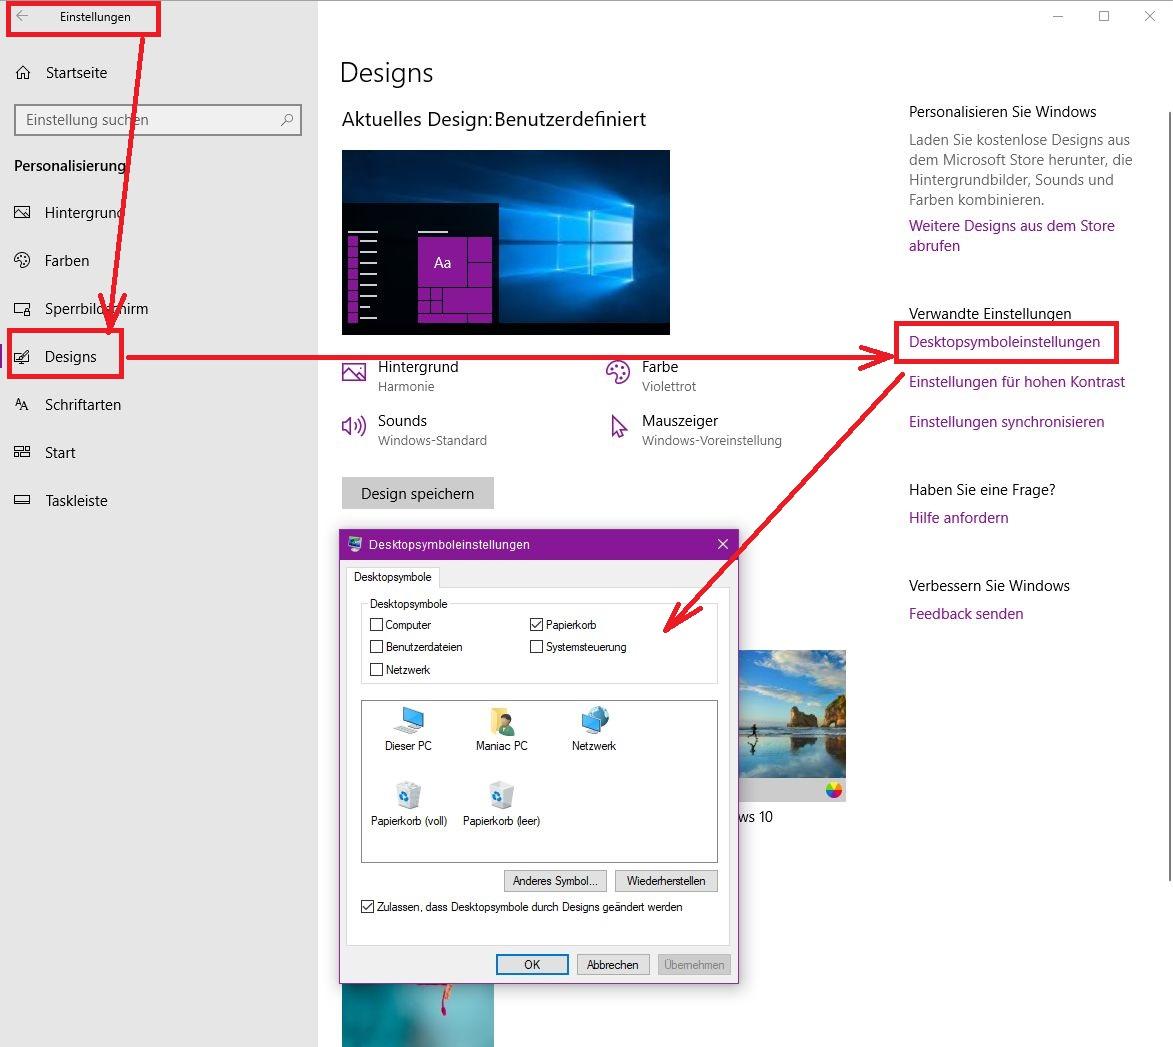 Windows 10: Desktopsymbole wiederherstellen - so geht´s